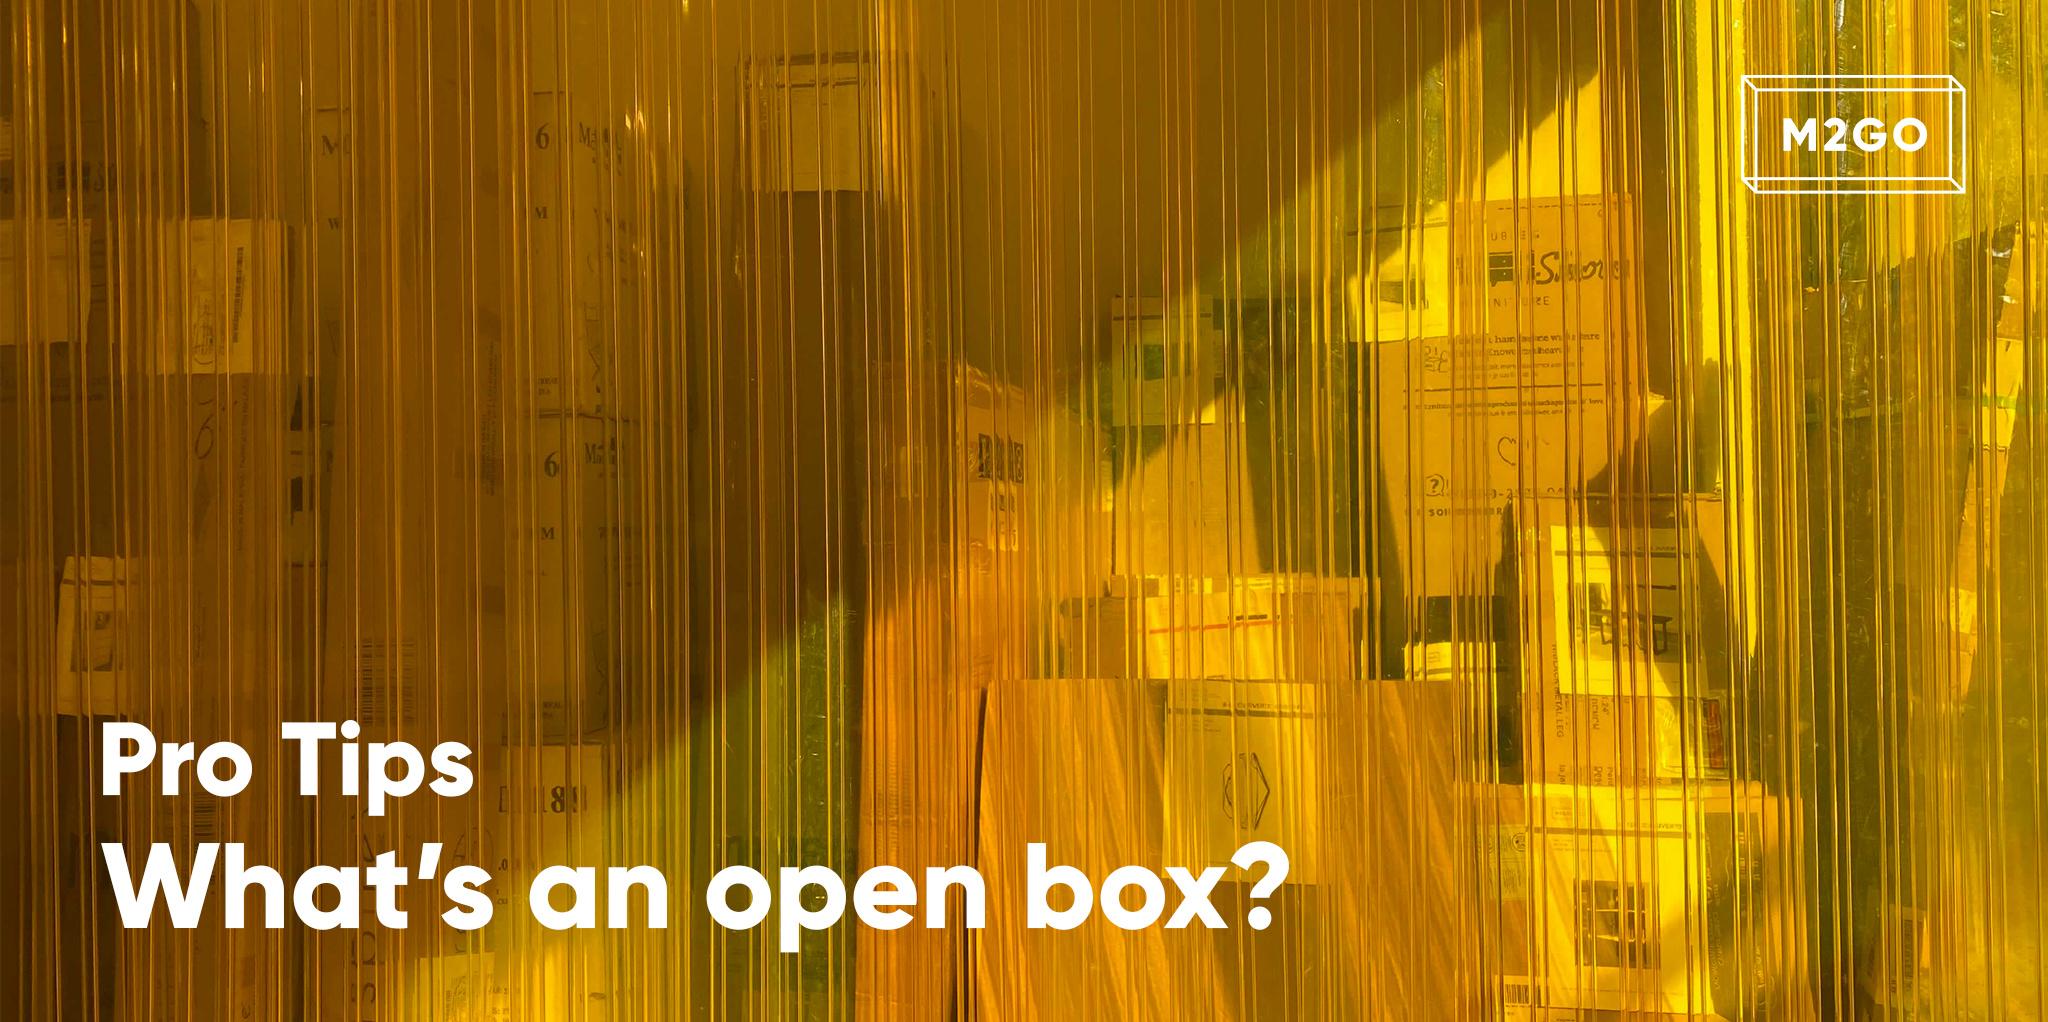 What's an open box?